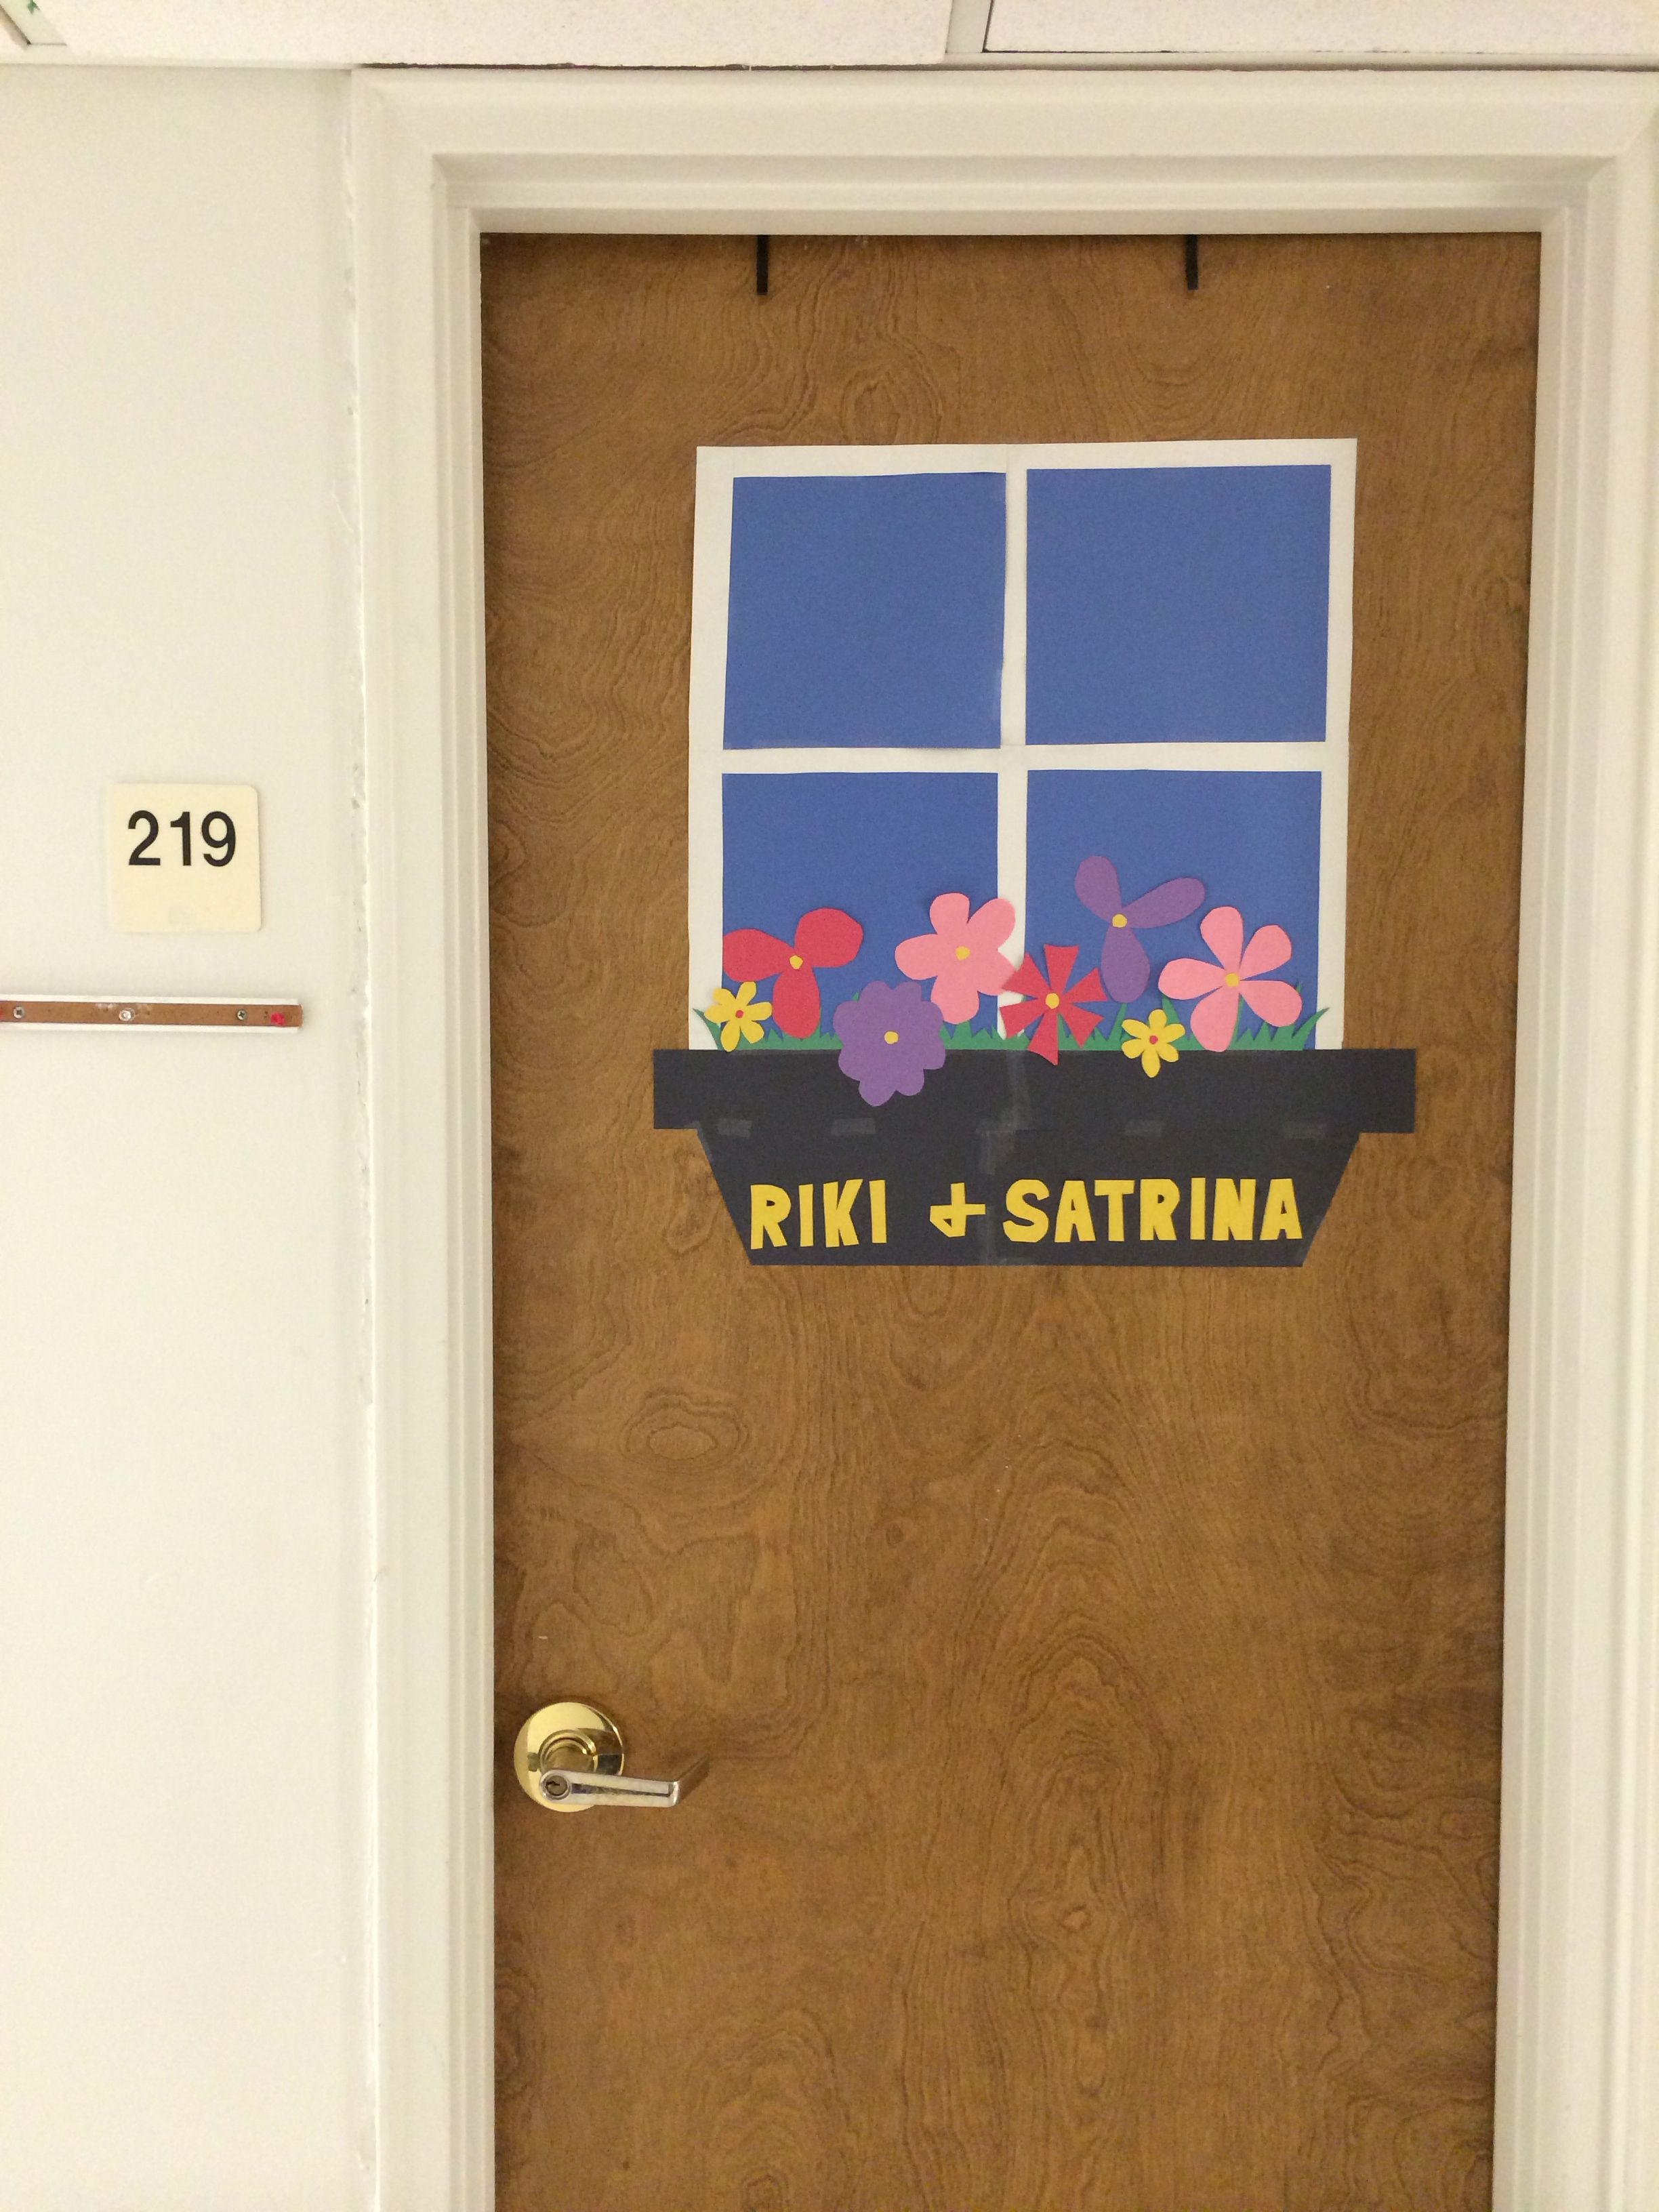 Easy Diy College Dorm Decor Decorating Ideas For Door Spring